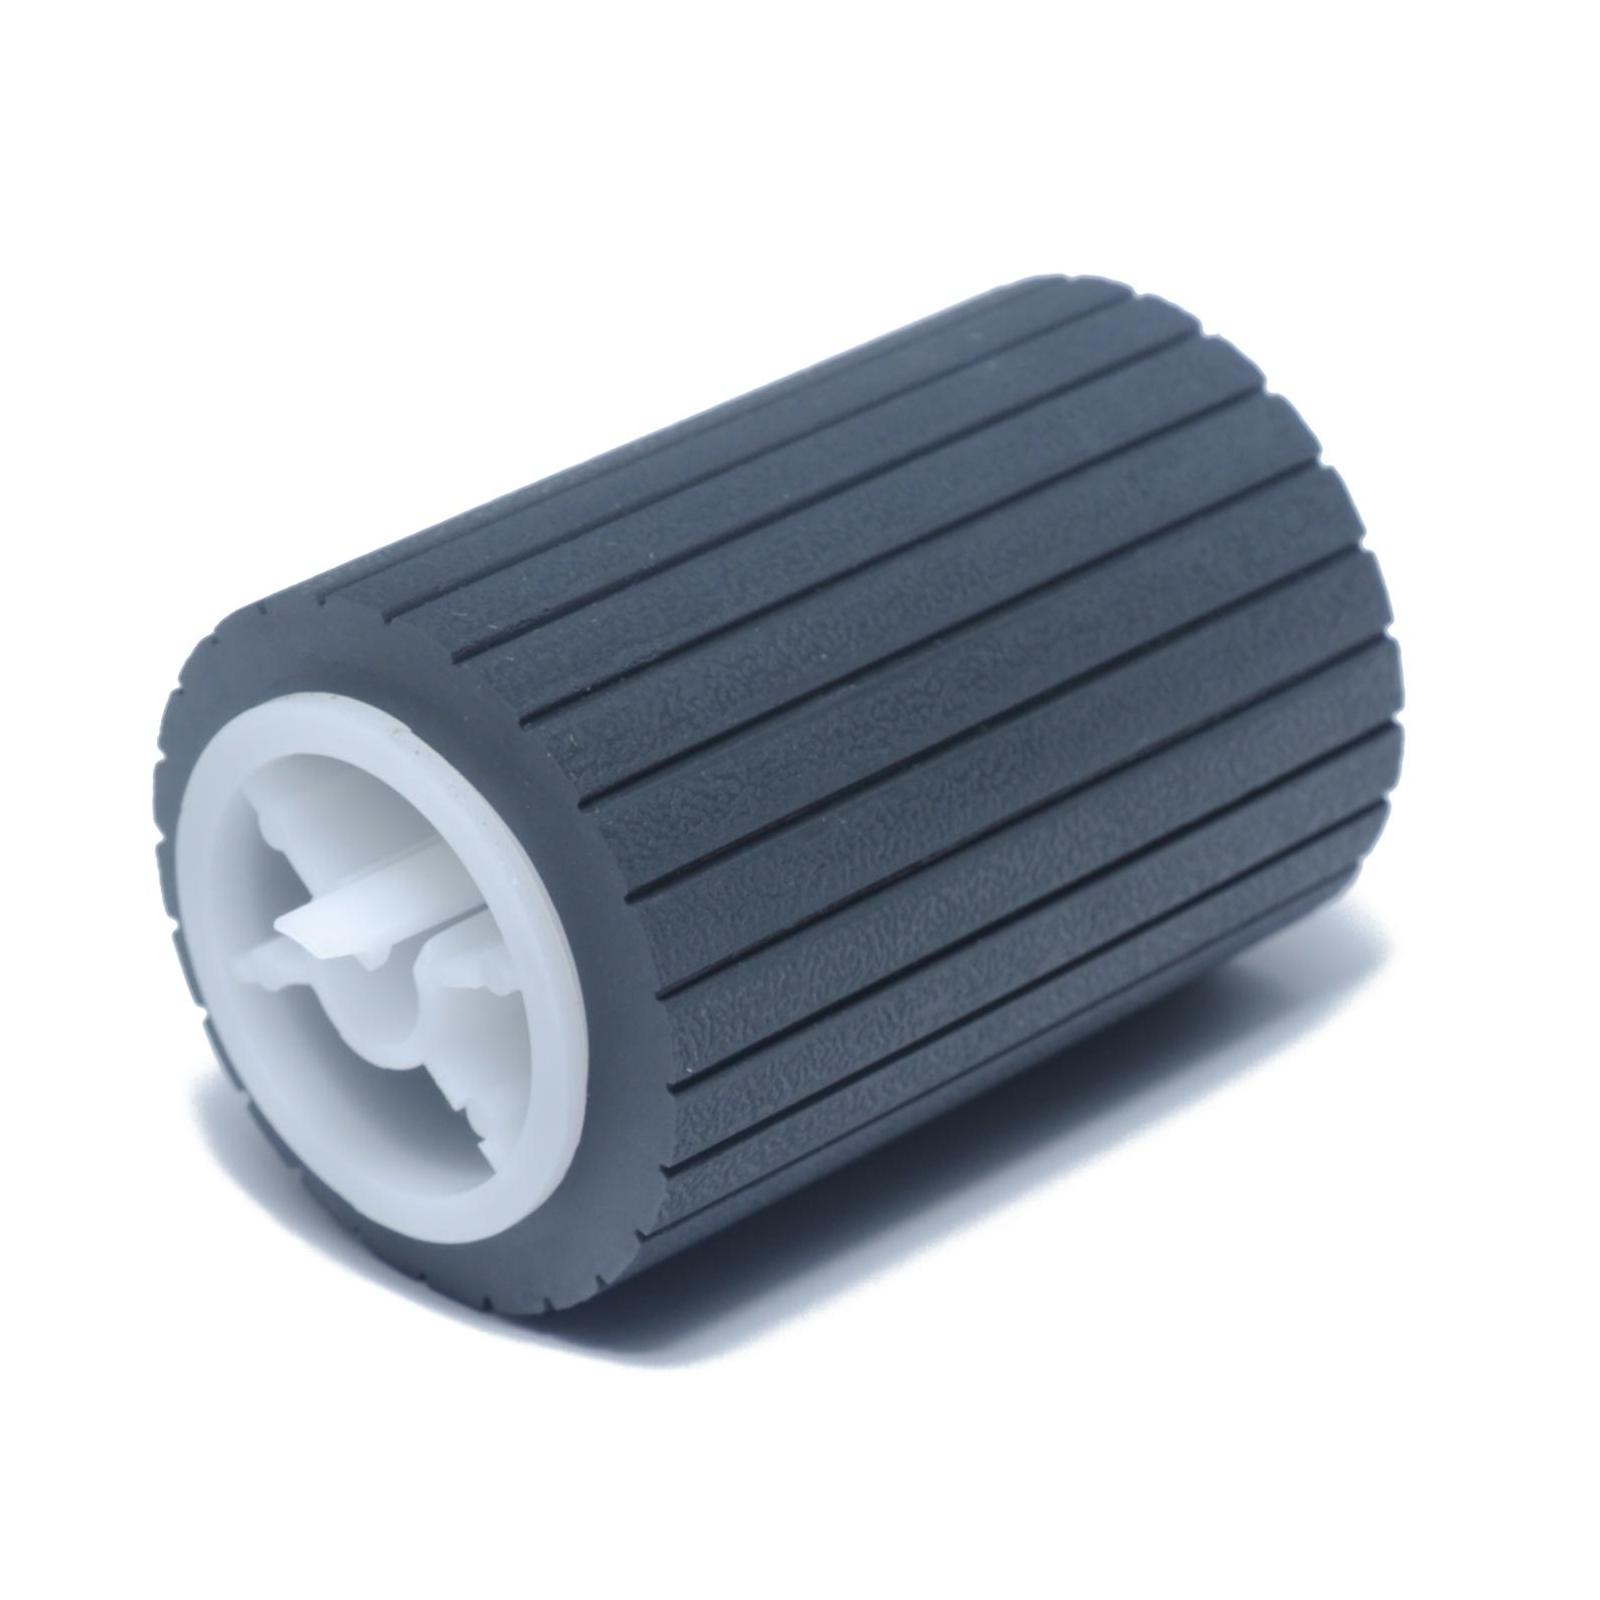 Ролик захвата бумаги RICOH AFICIO 1013/1515/ MP161F/MP301 (AF031061) Pickup Rolle CET (CET6452)